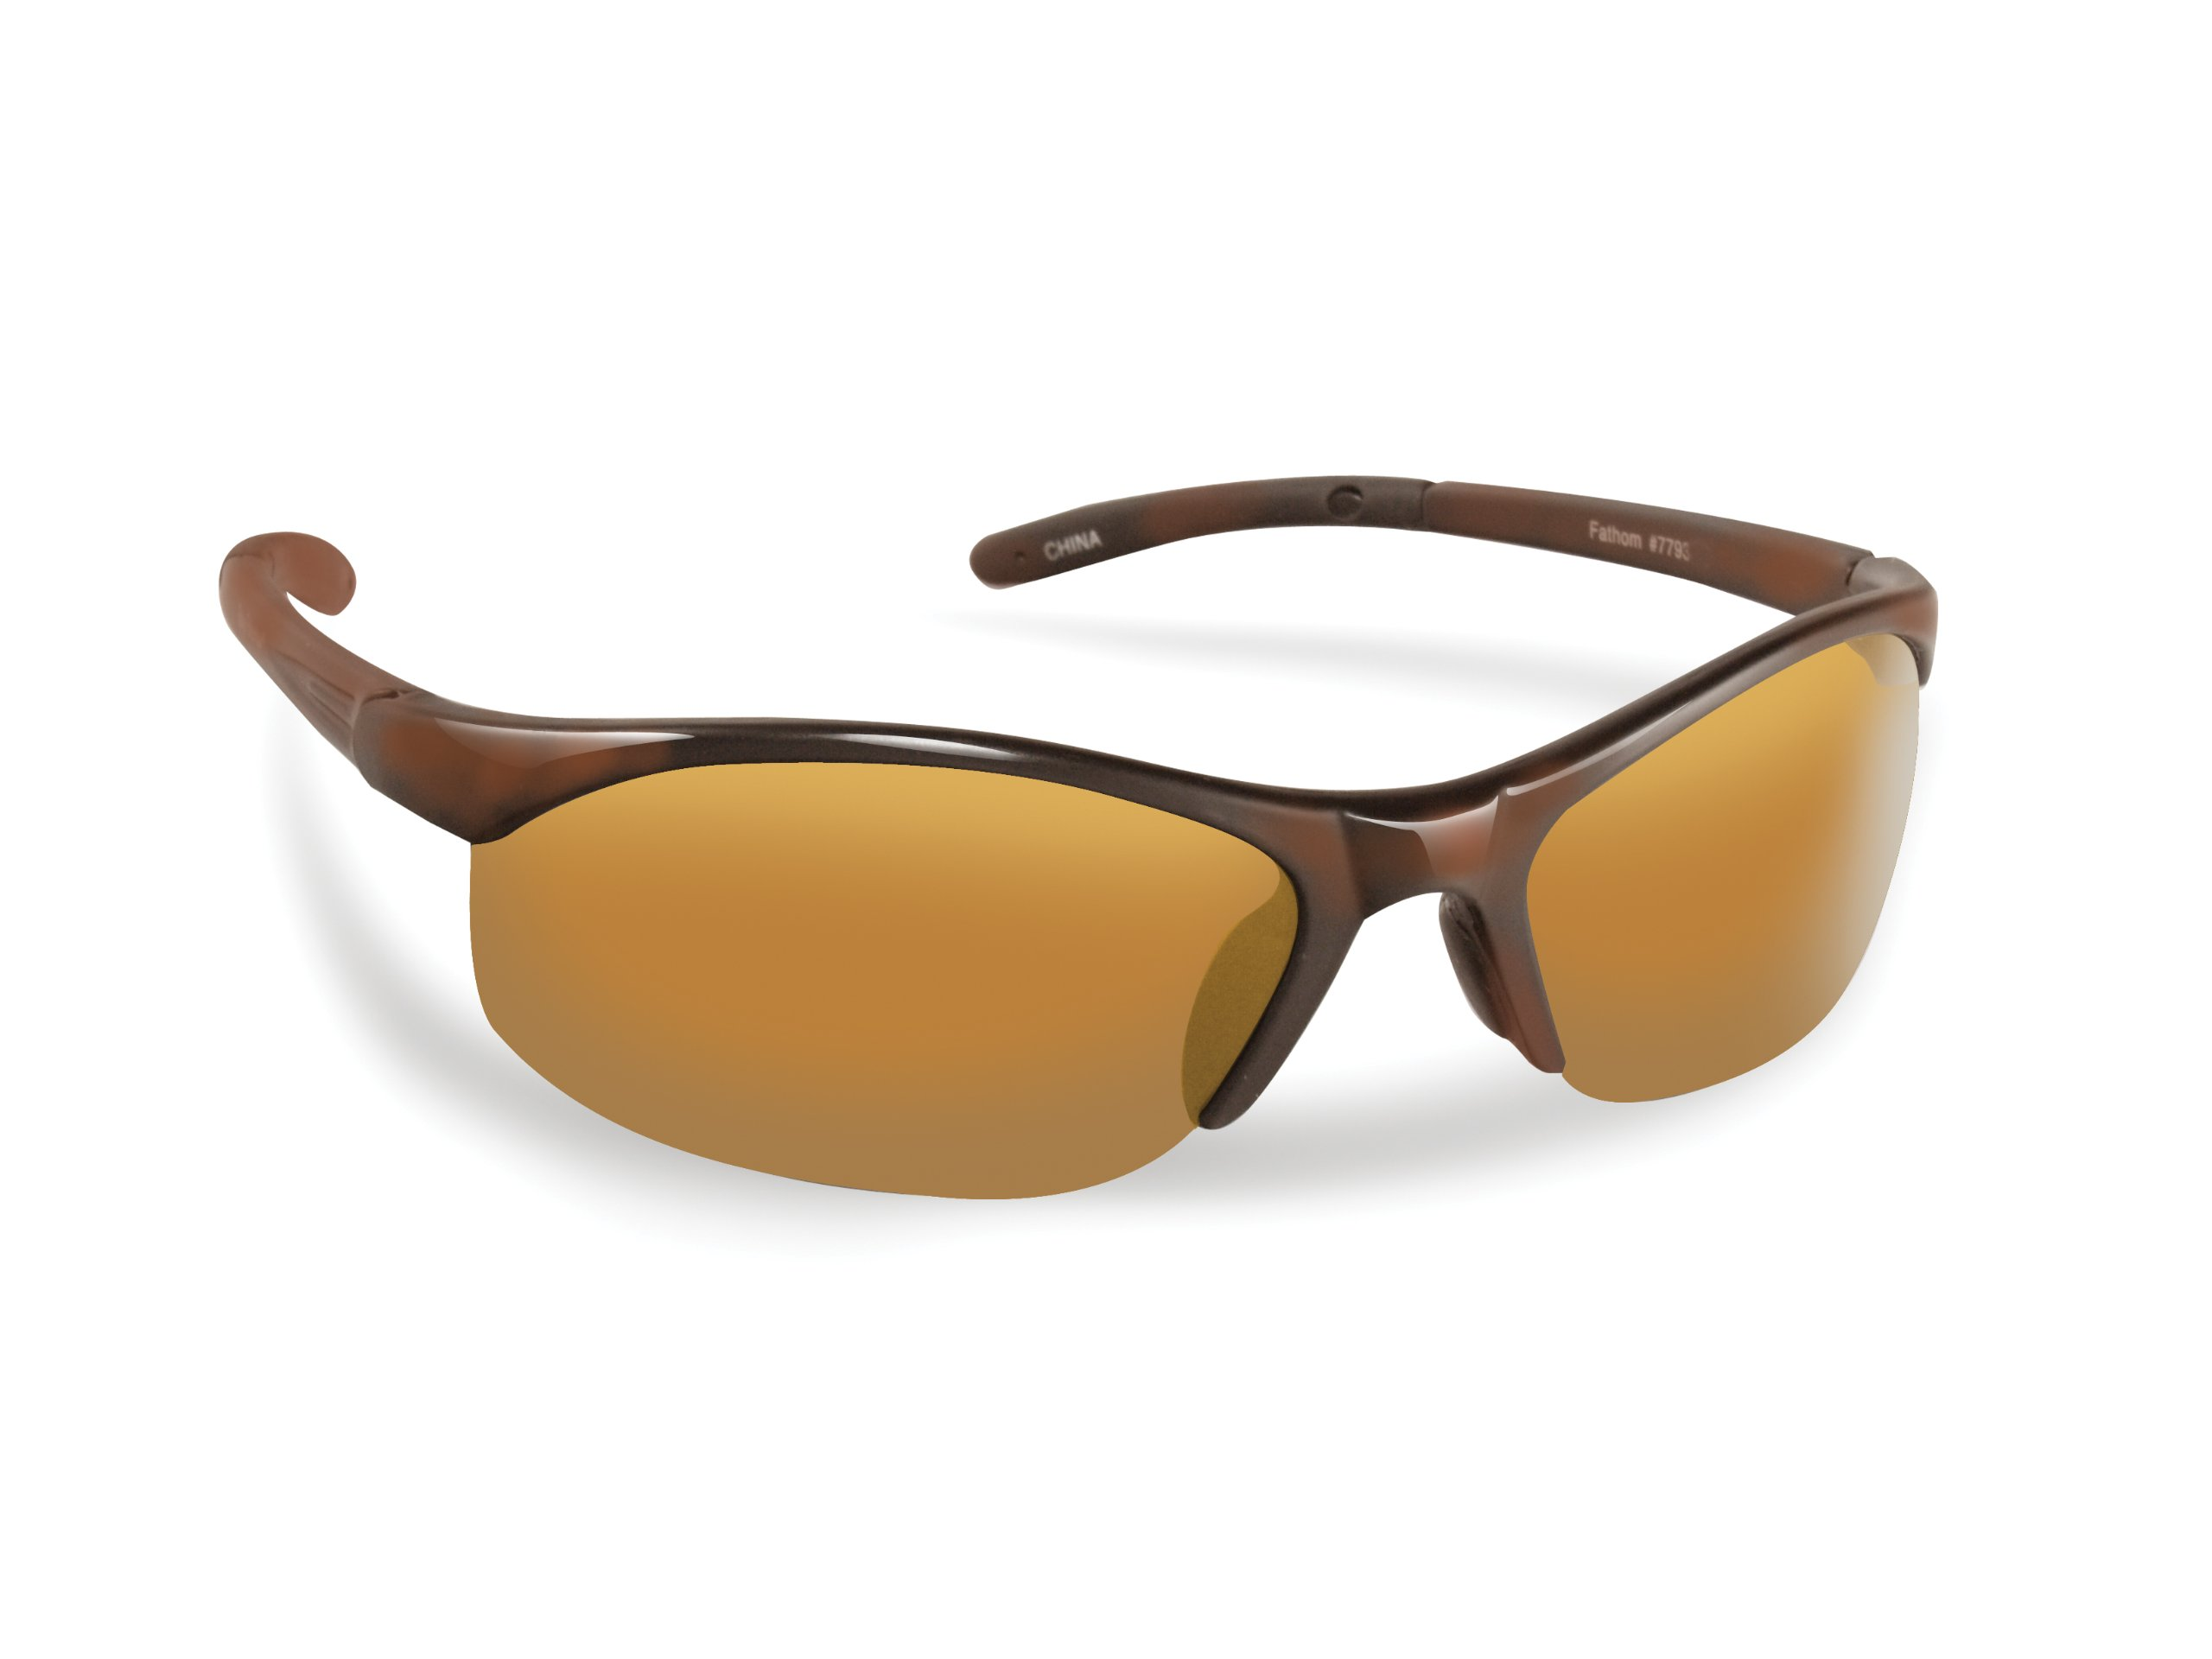 Flying Fisherman Bristol Polarized Sunglasses